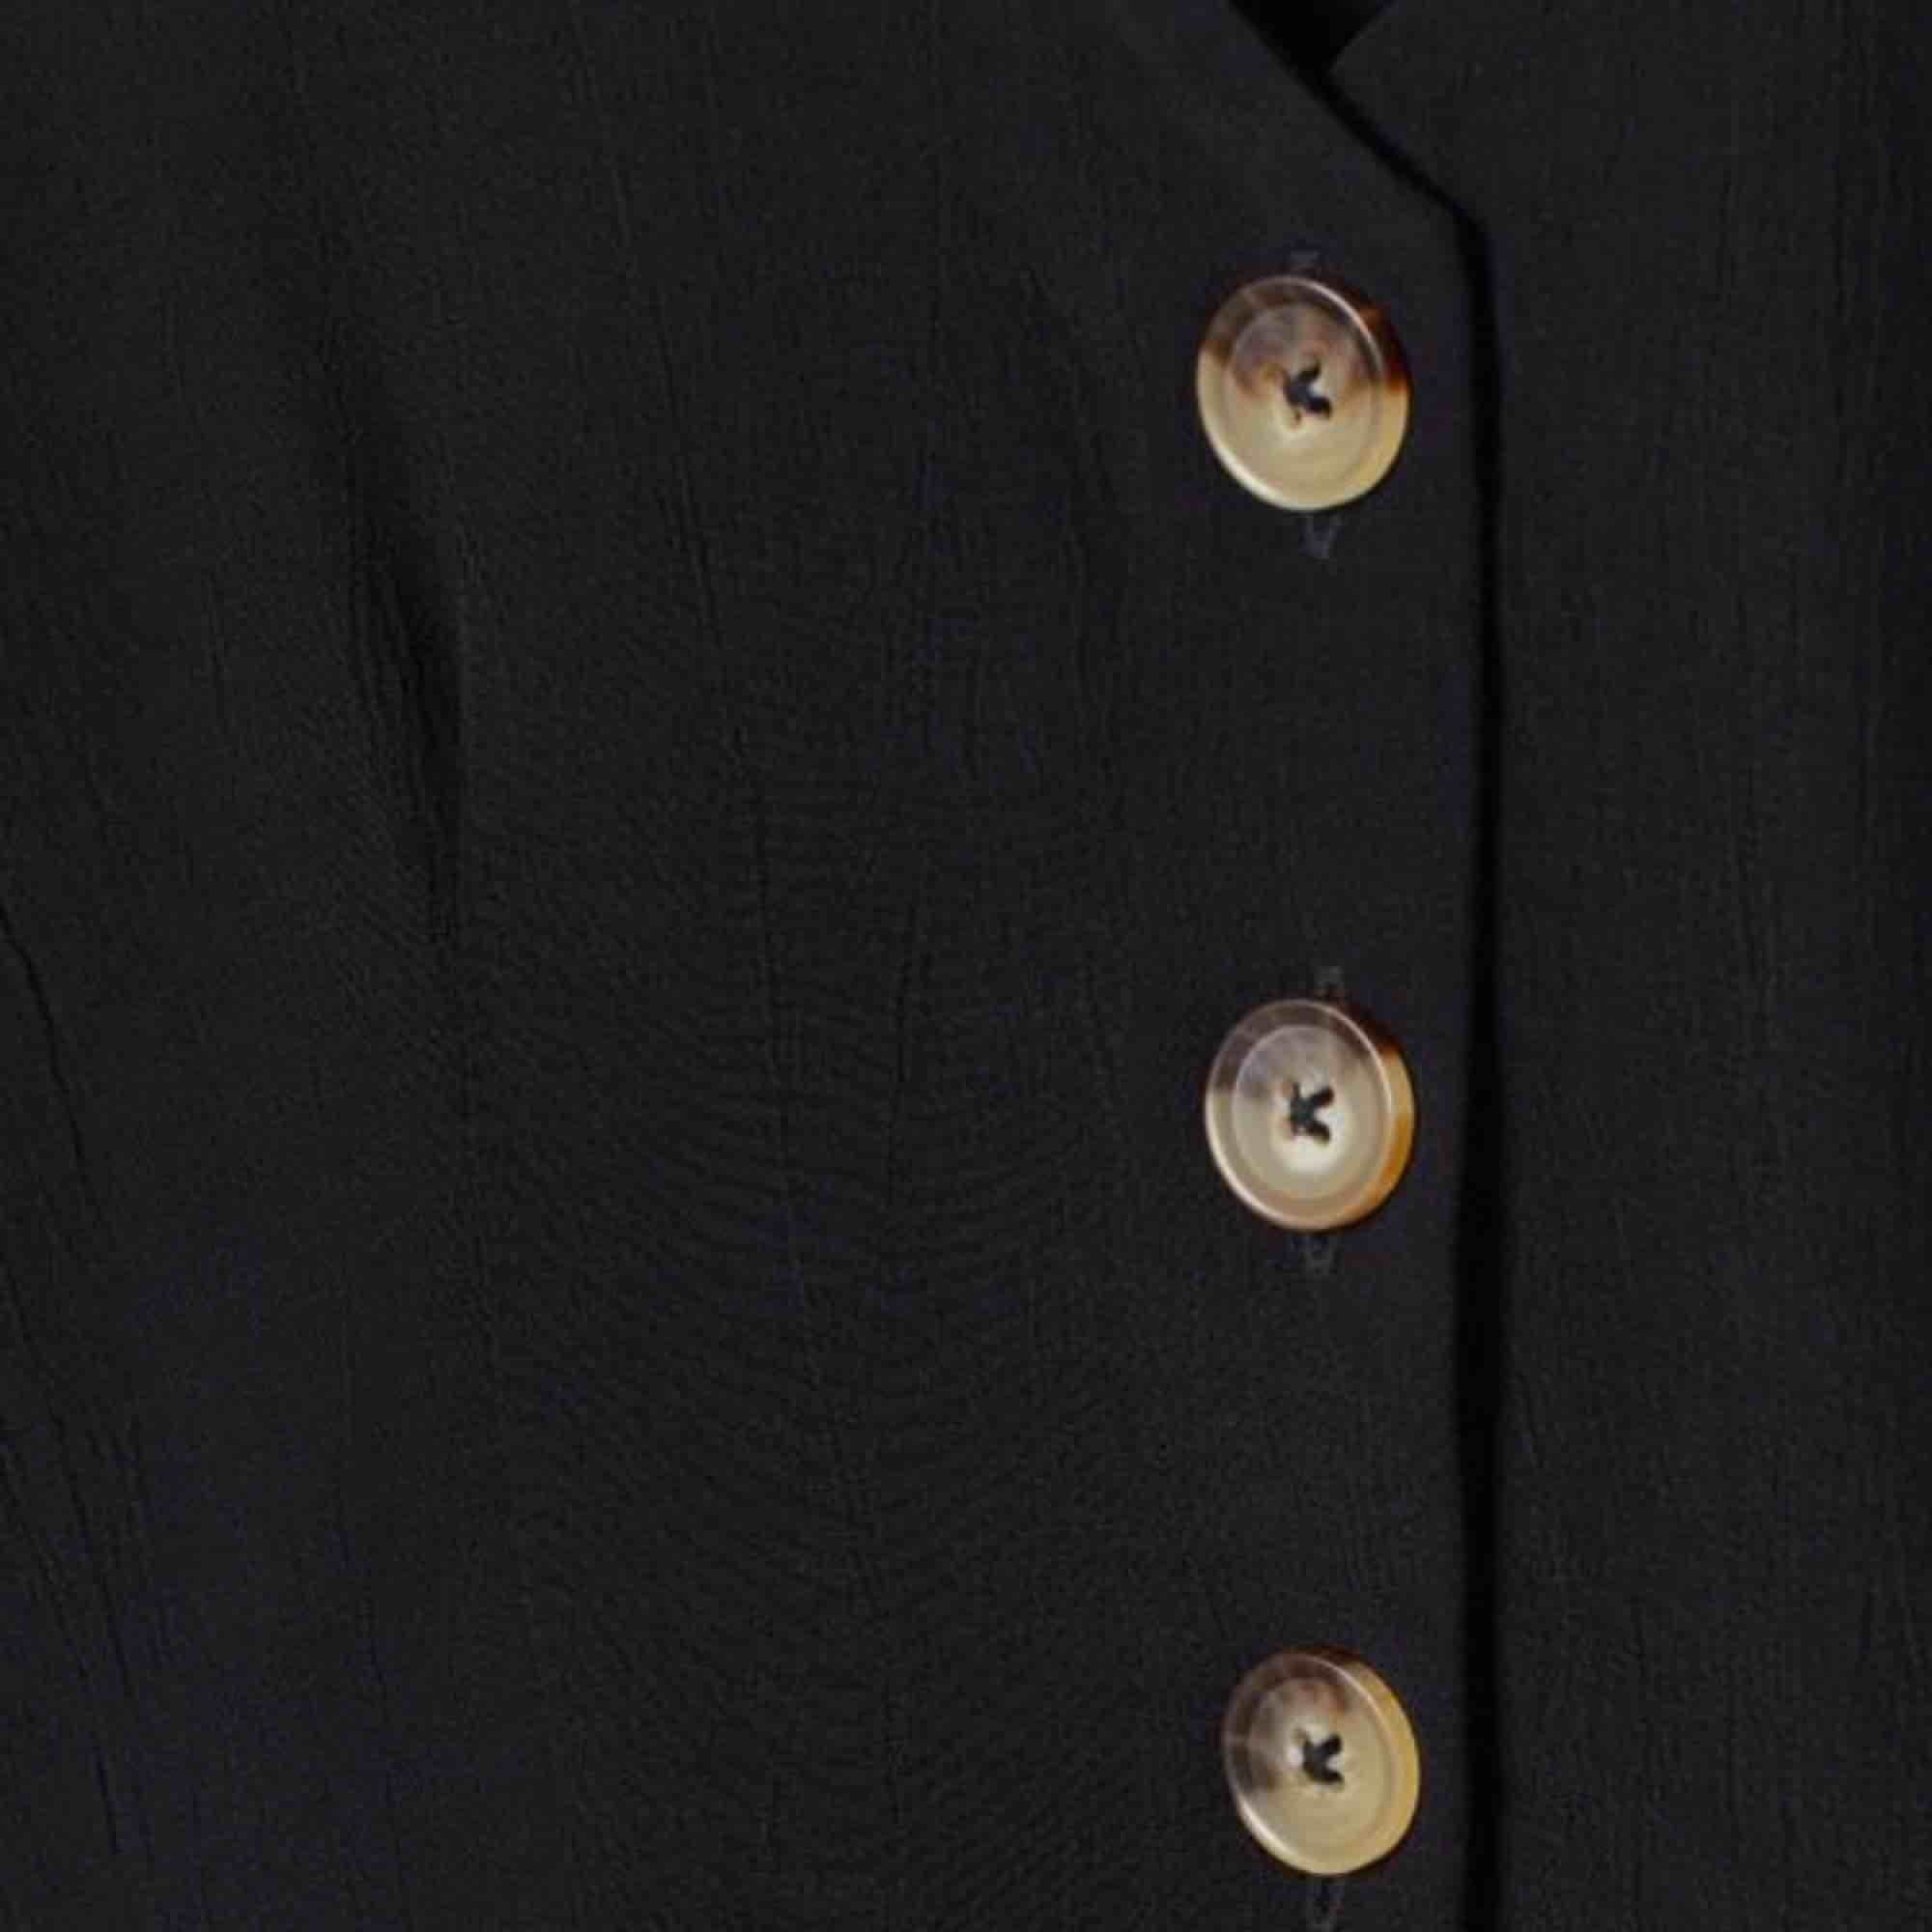 Superfin somrig volangblus i svart med brun/beicha knappar ☀️🌿🍸 Frakt 42 kr eller mötas i Stockholm! . Blusar.